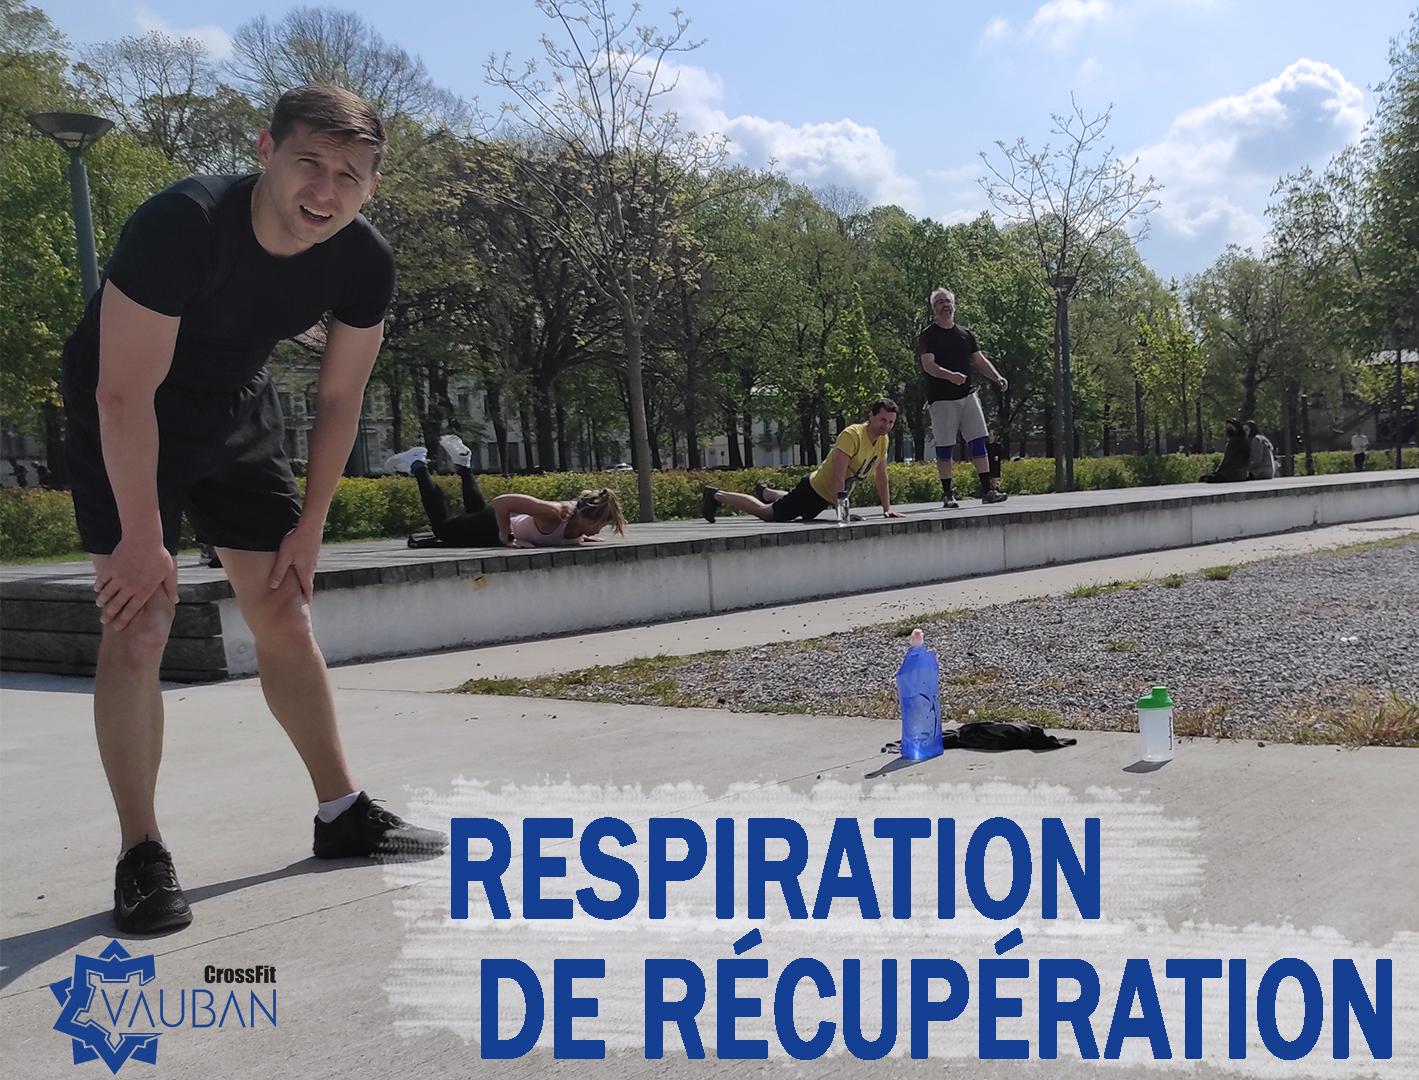 Respiration CrossFit Vauban Lille